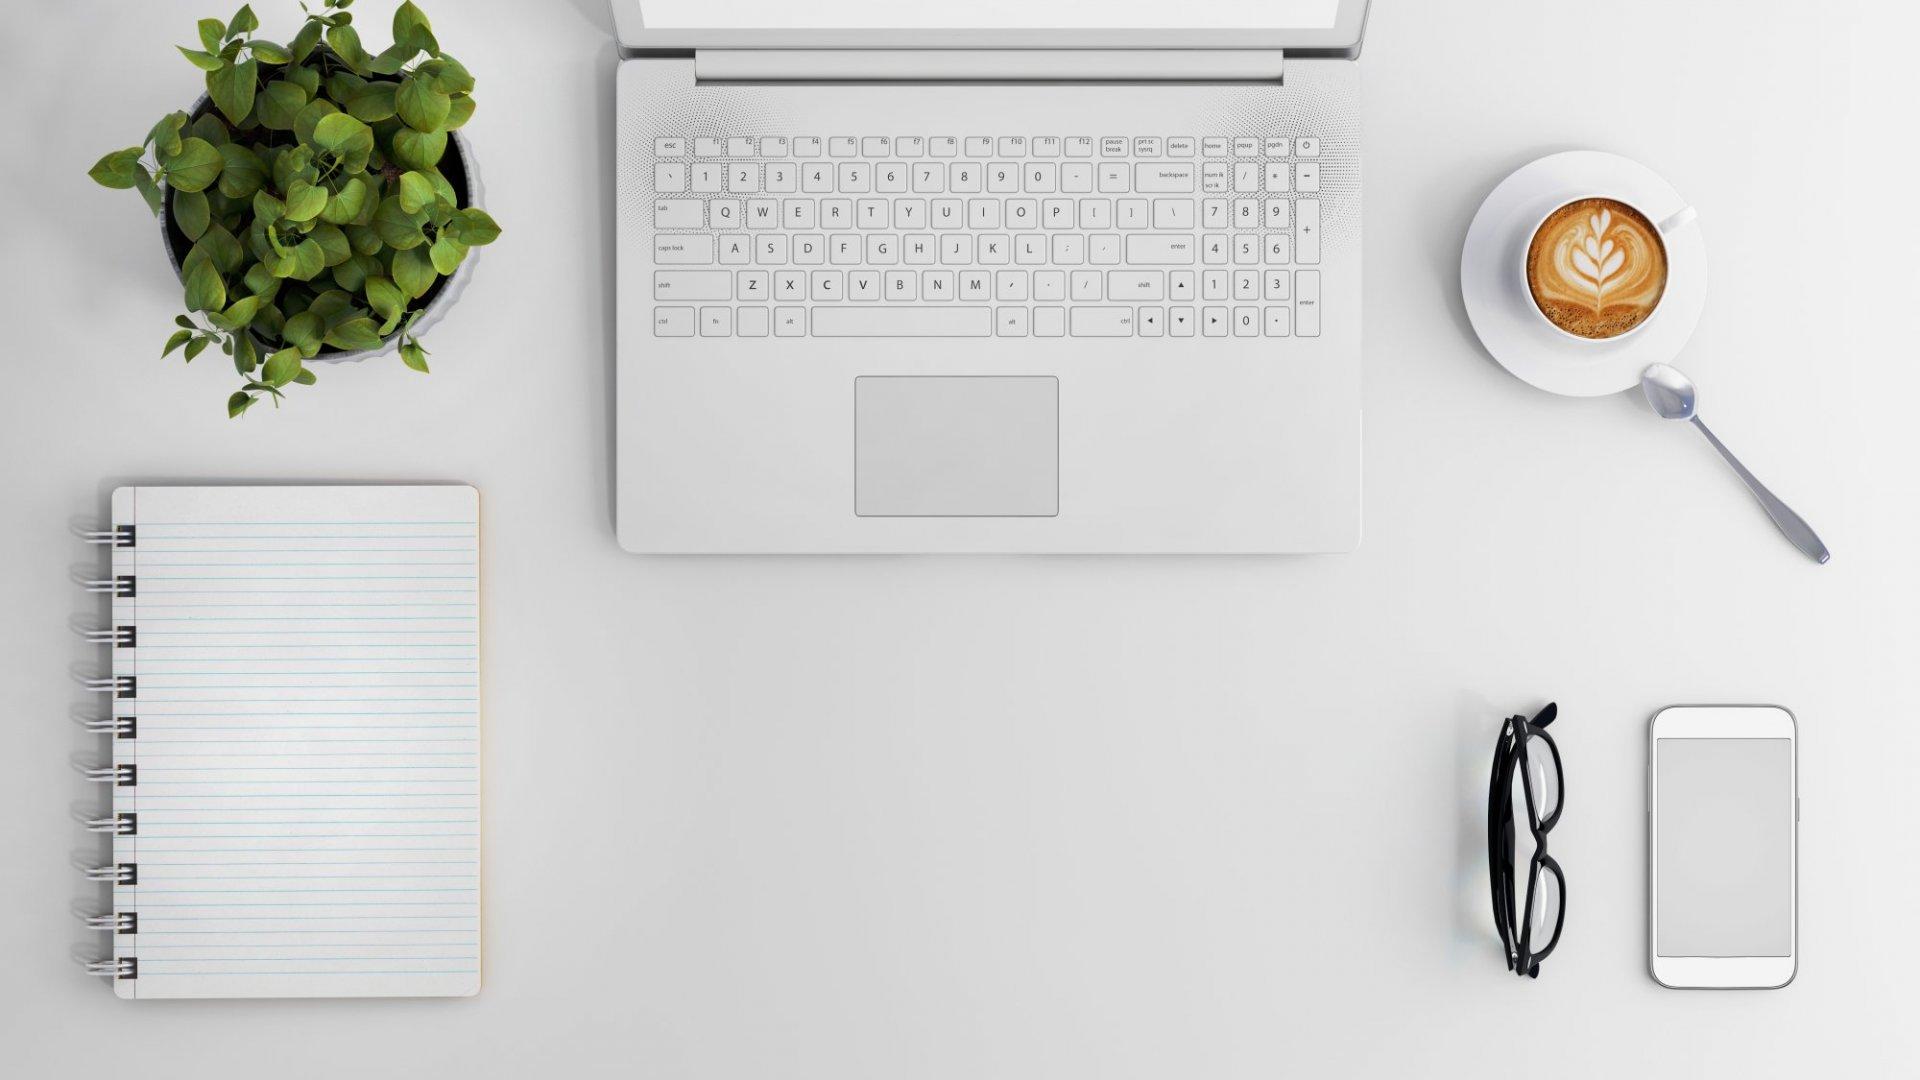 Study: Plants Reduce Office Stress